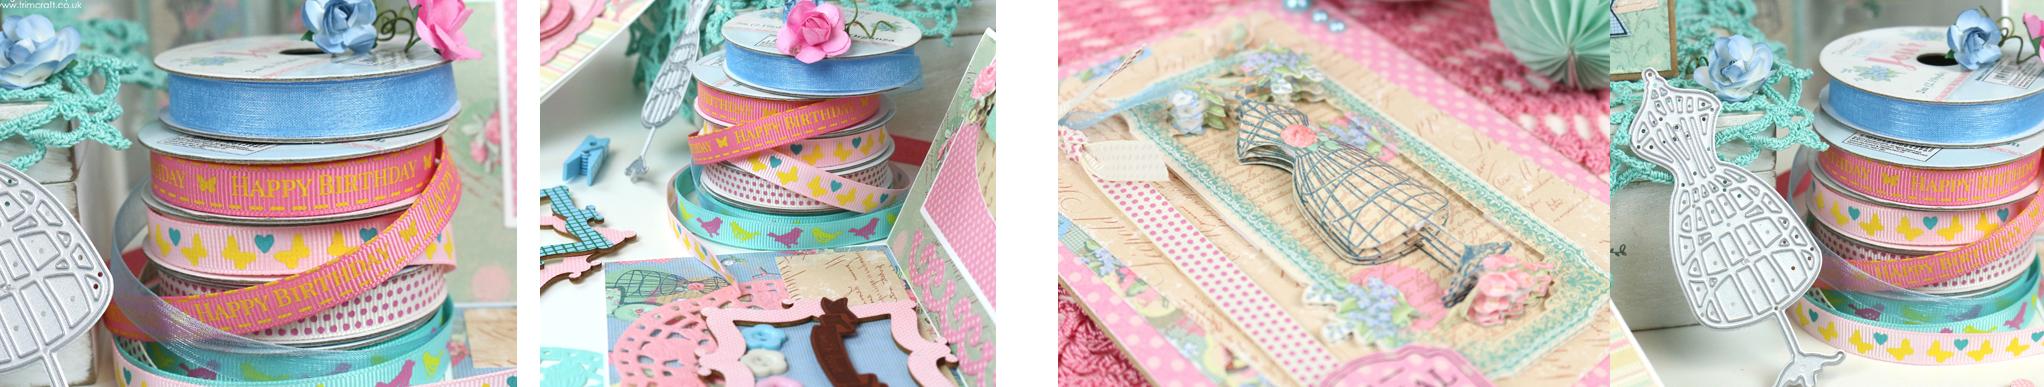 Papercraft Range